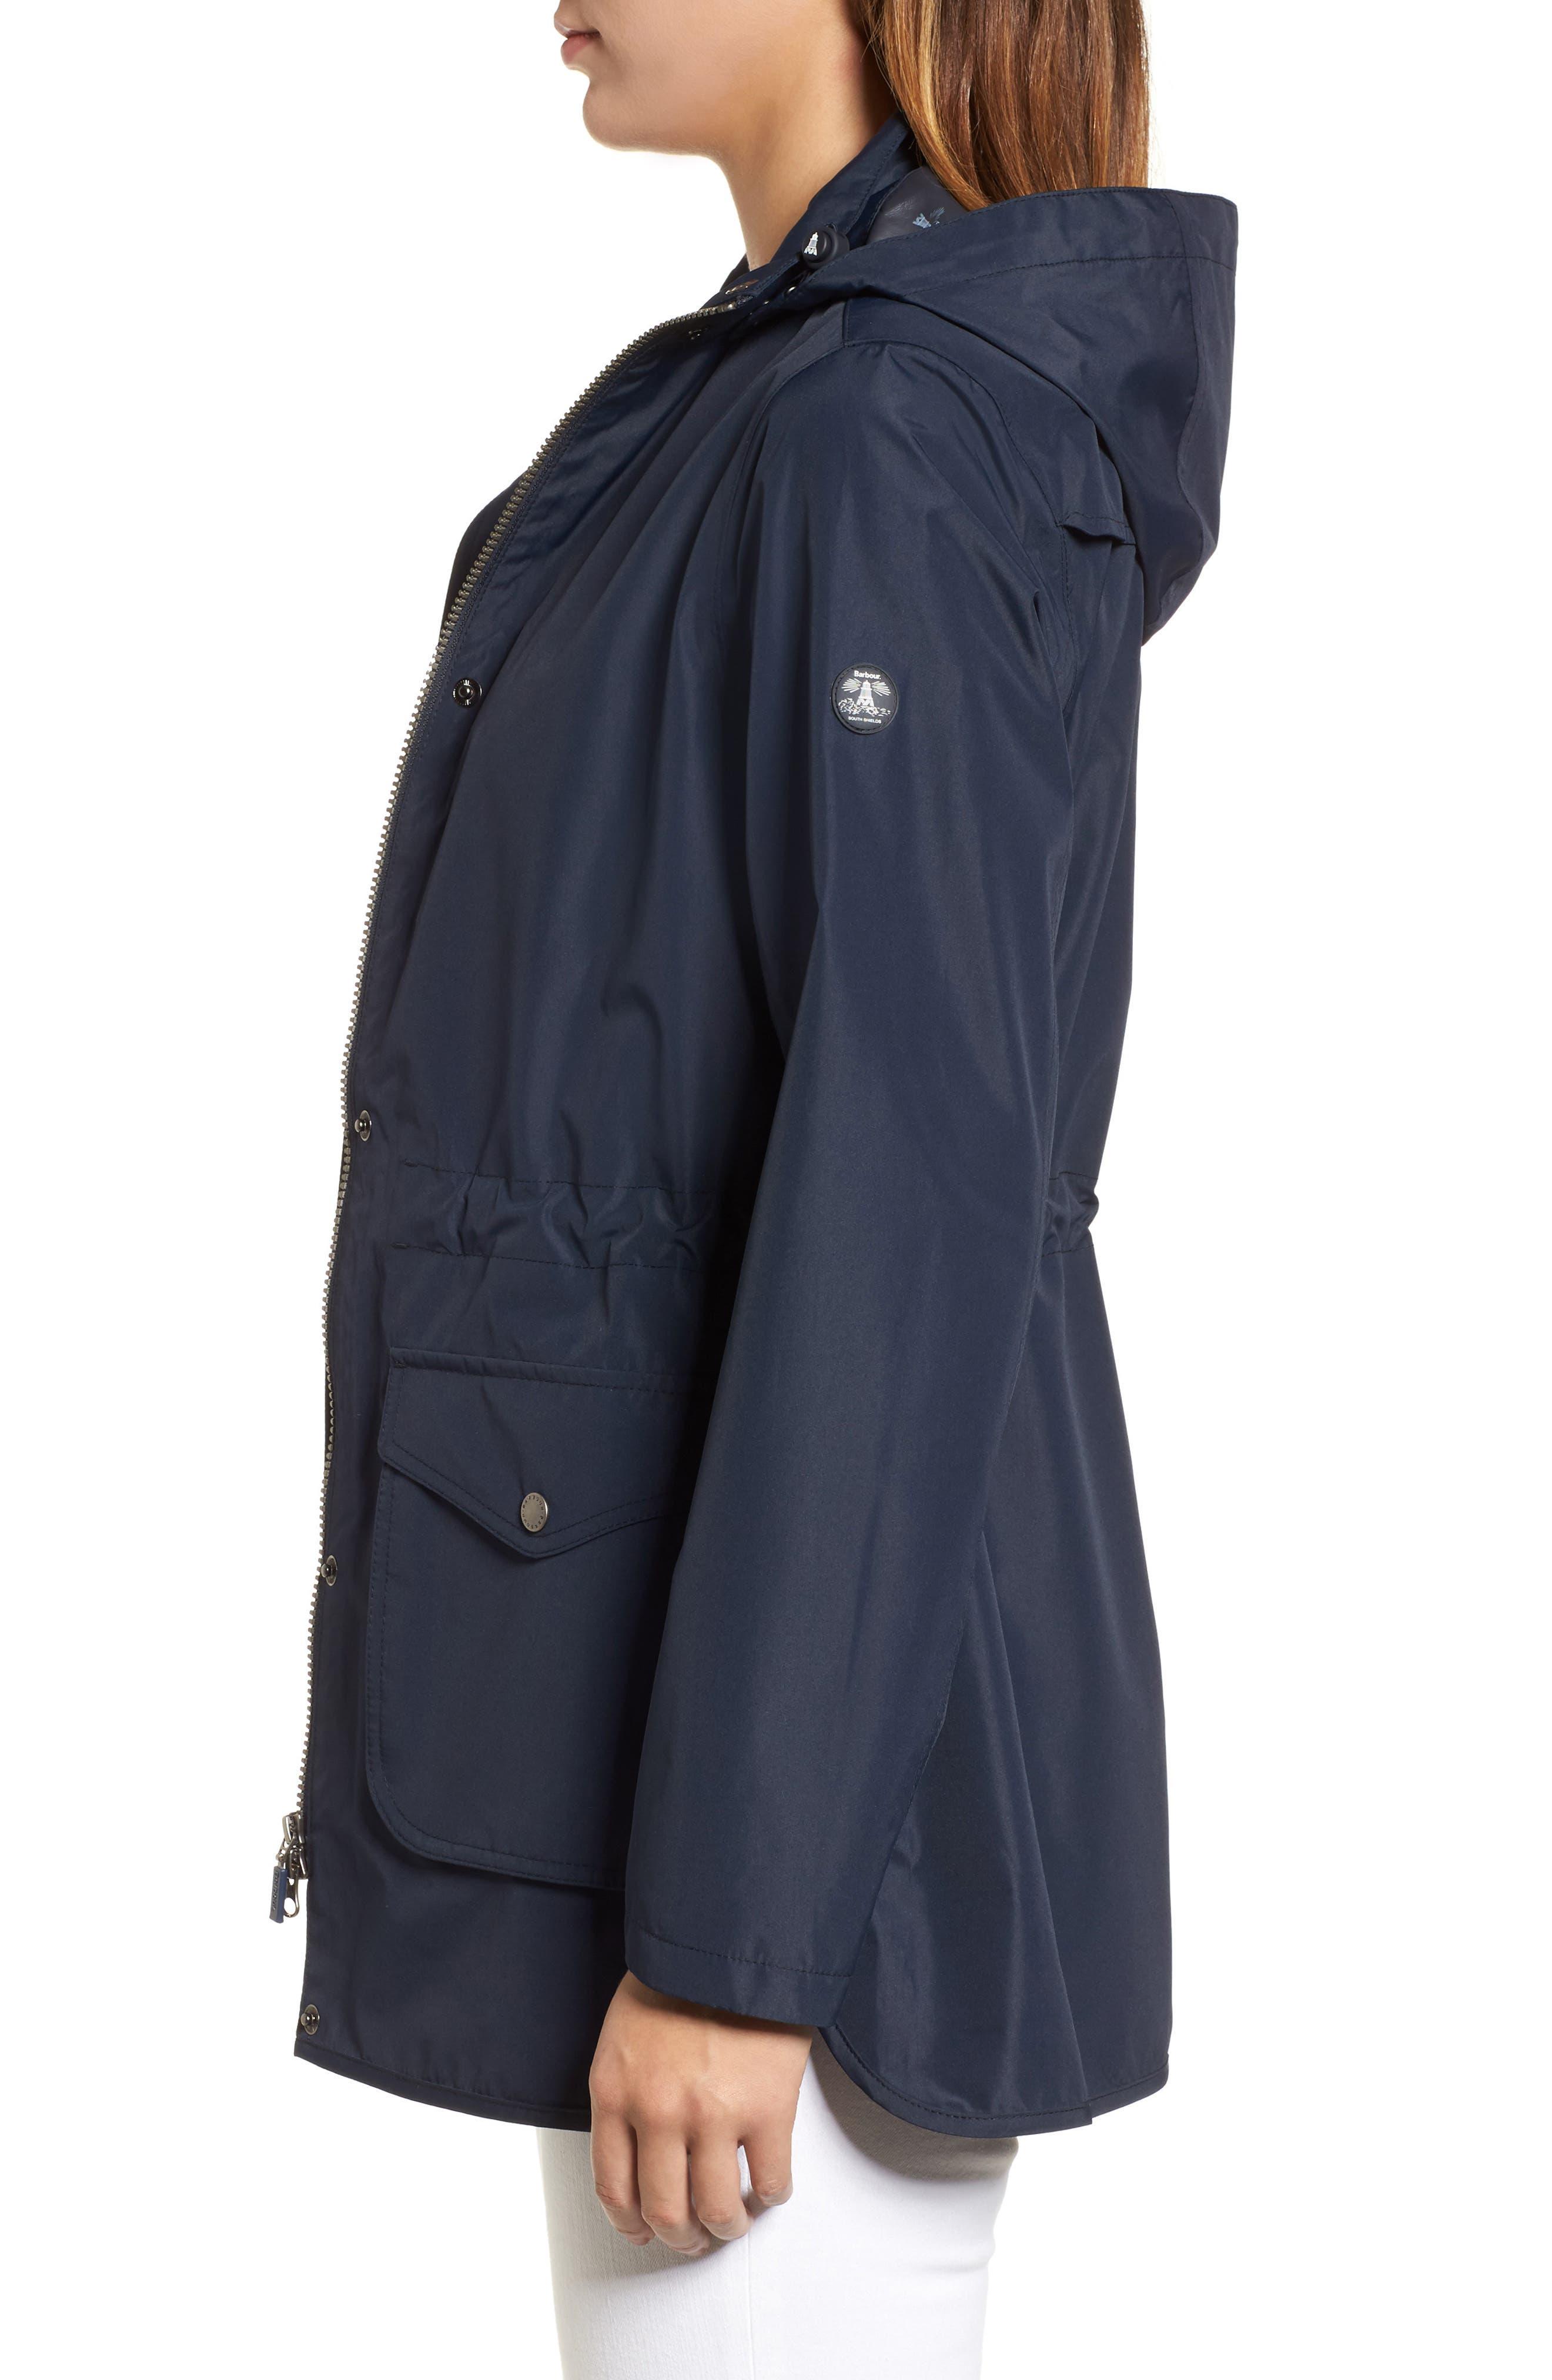 Studland Waterproof Jacket,                             Alternate thumbnail 5, color,                             Navy